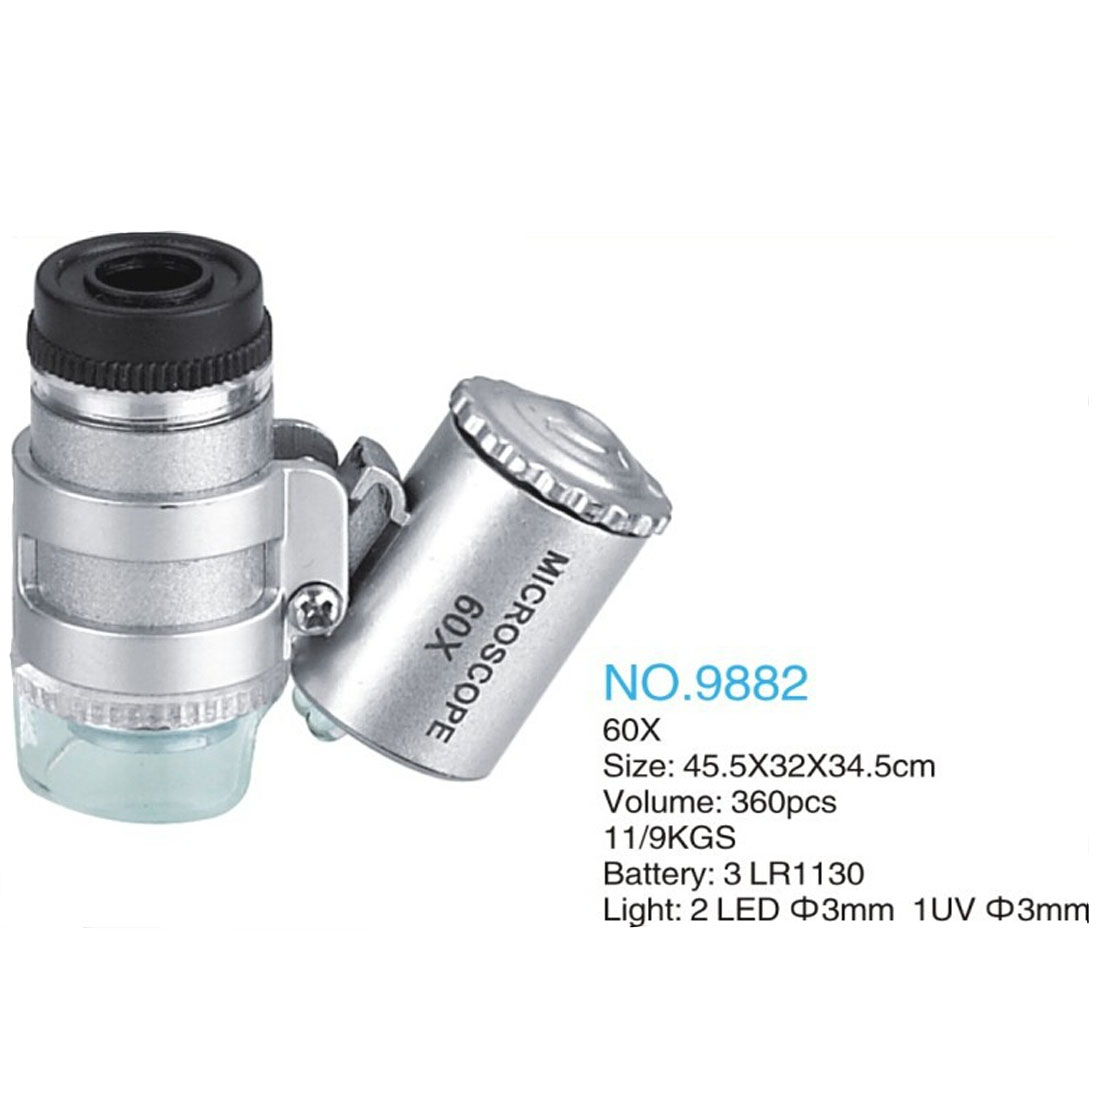 MAGNIFIER GLASS-folding-30x++-1-mini 60x microscope lighted#m4 1